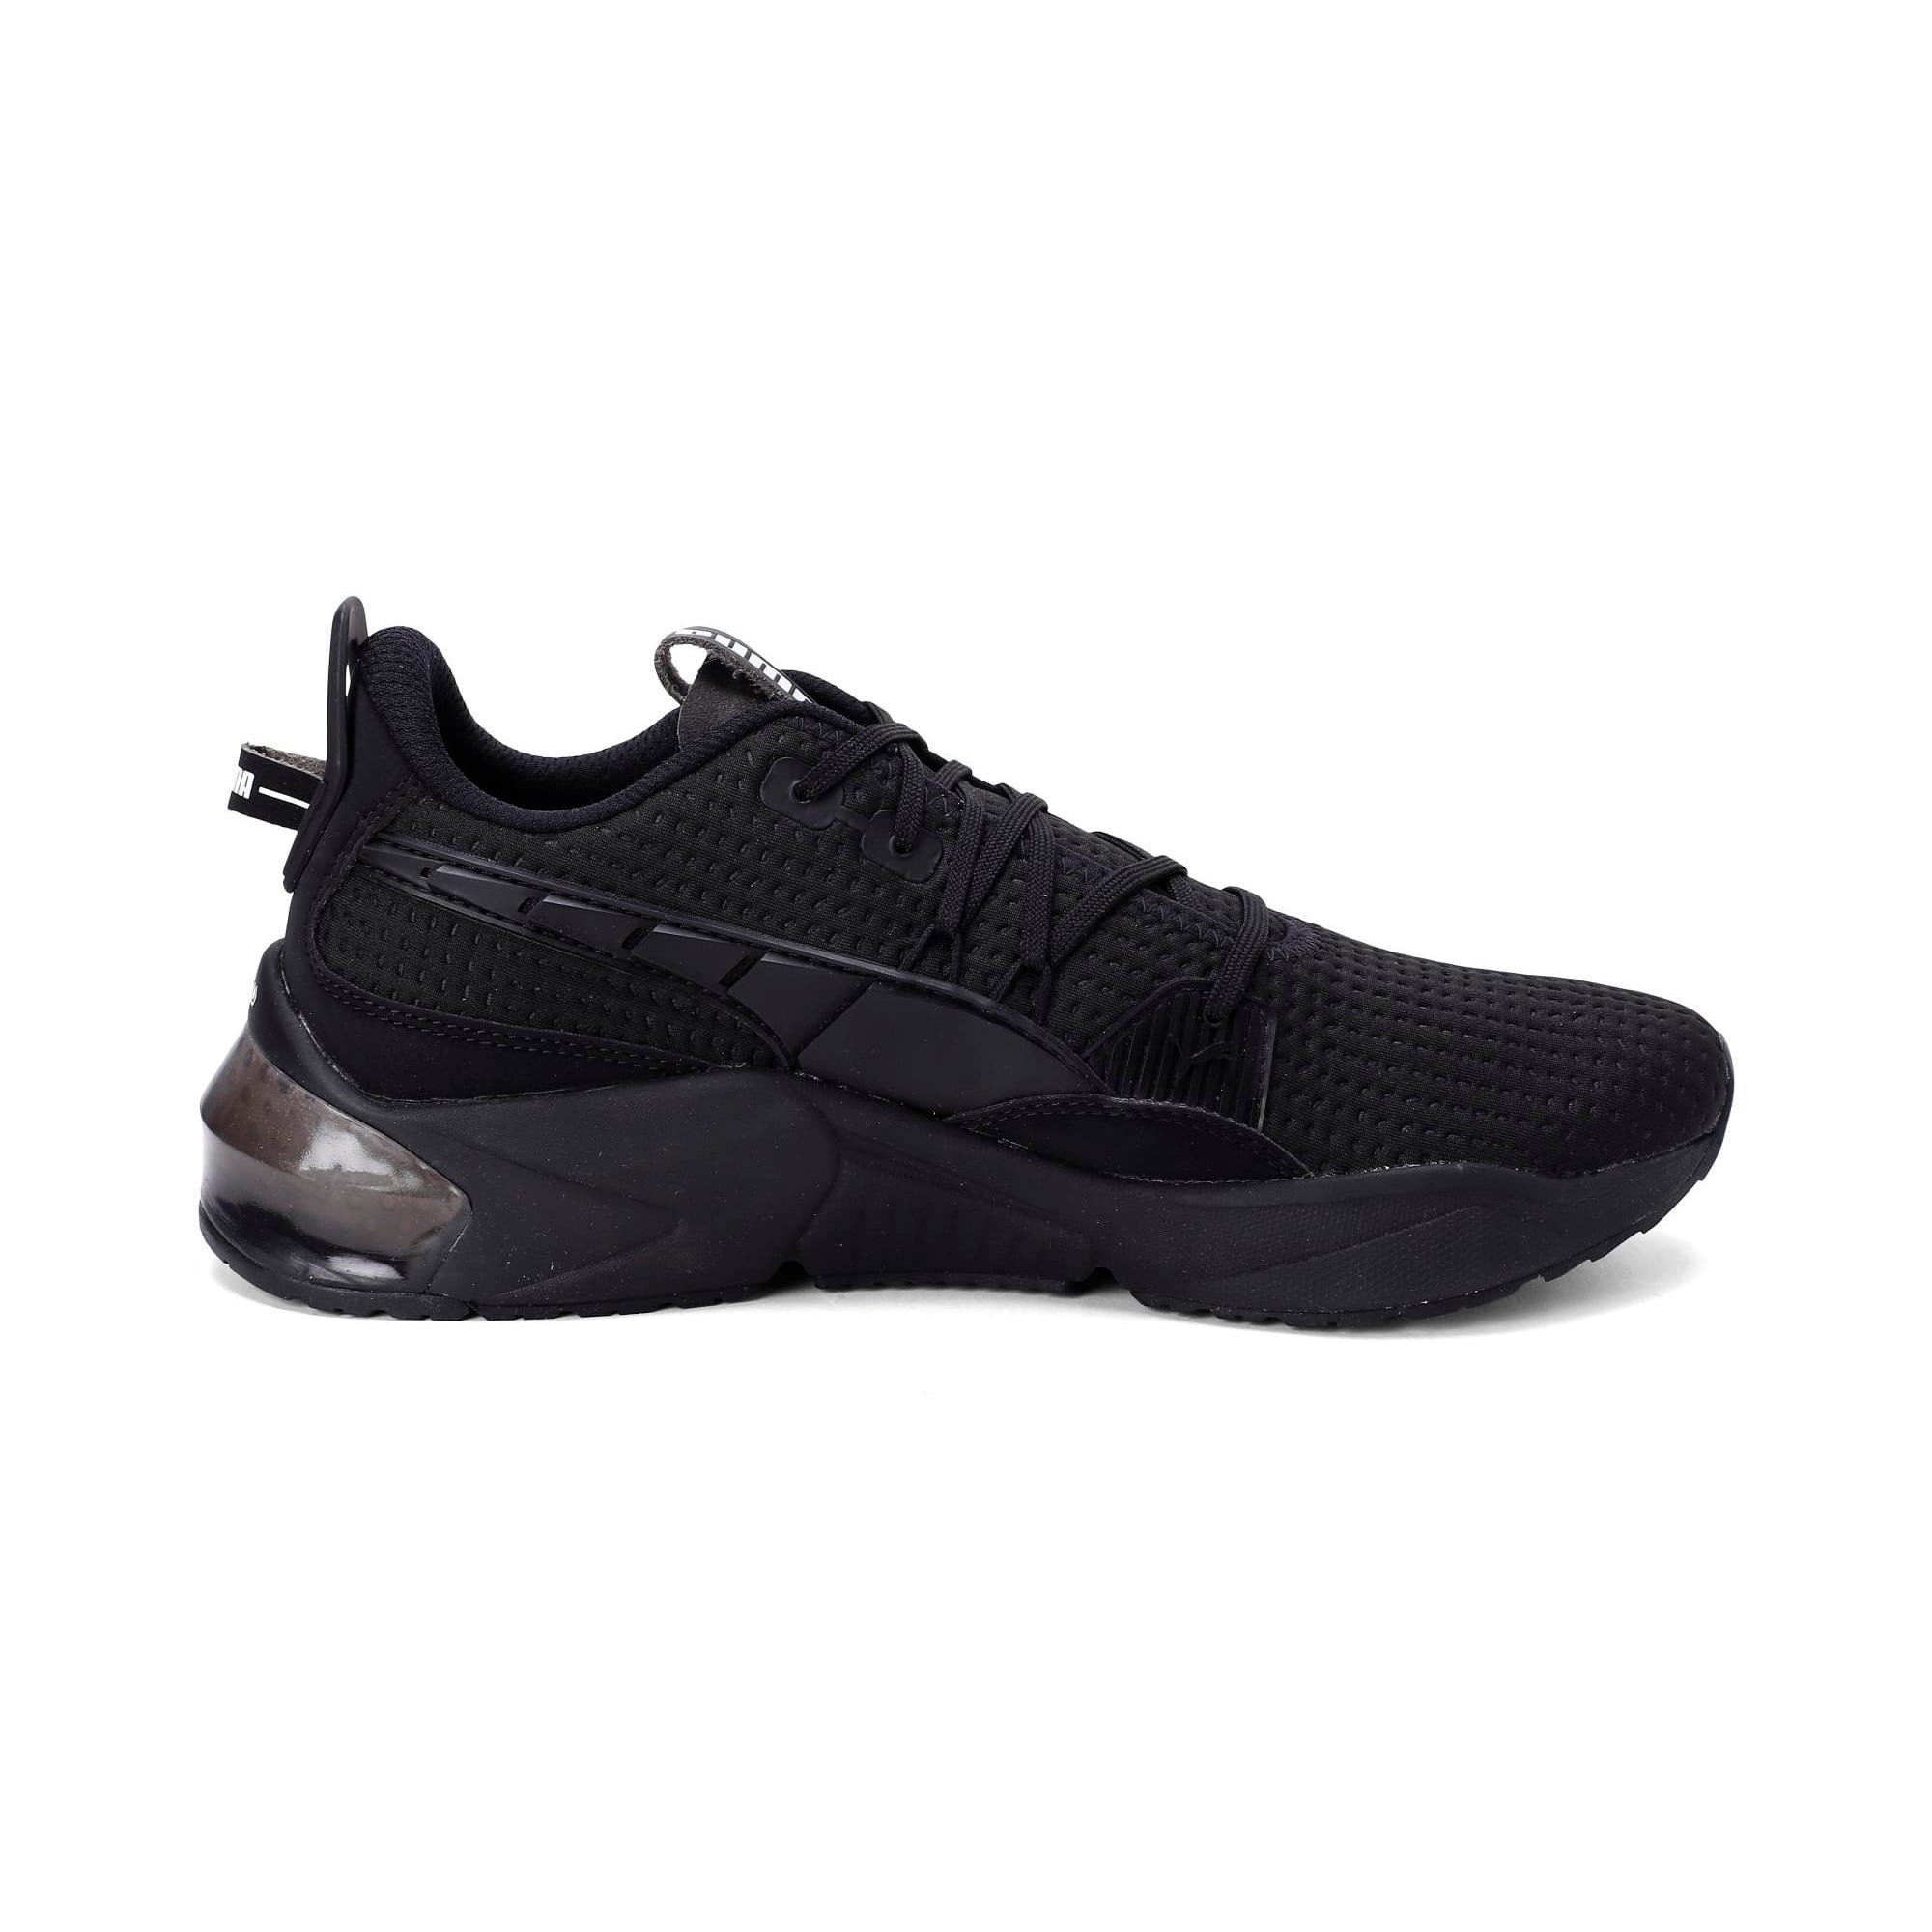 Thumbnail 7 of LQDCELL Optic Flight Suit Men's Running Shoes, Puma Black, medium-IND